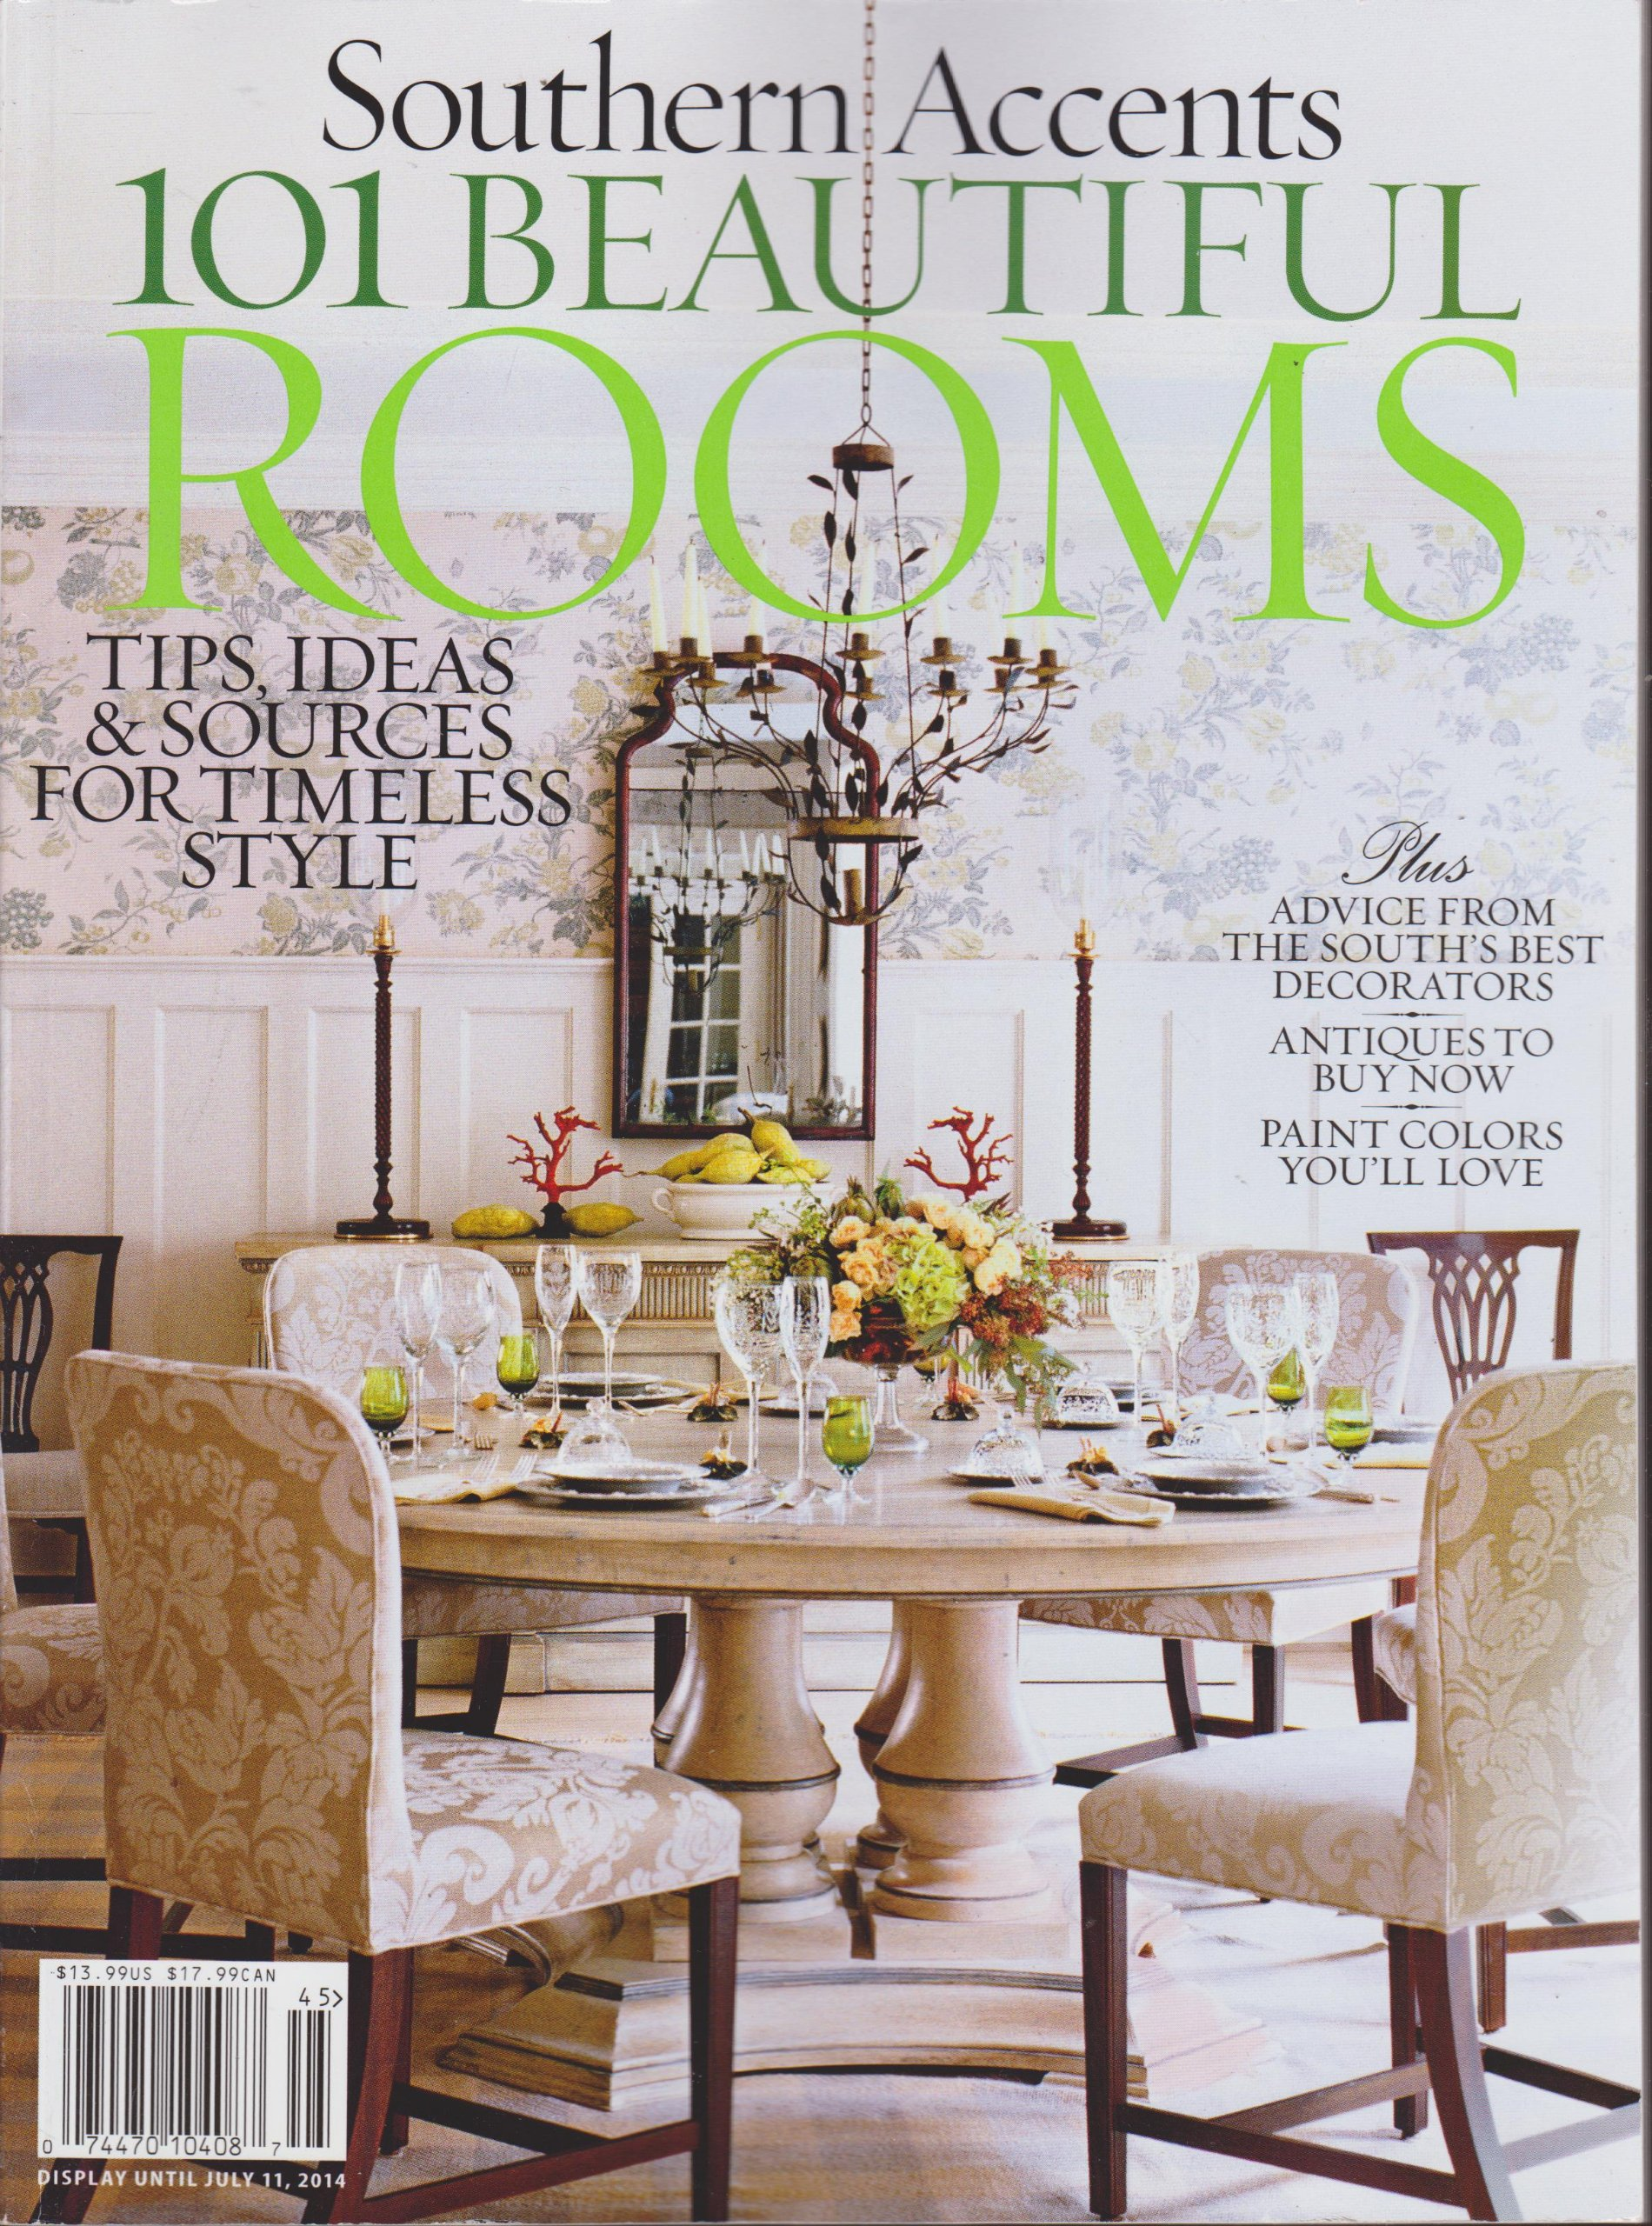 Southern Accents 101 Beautiful Rooms Magazine 2014 pdf epub